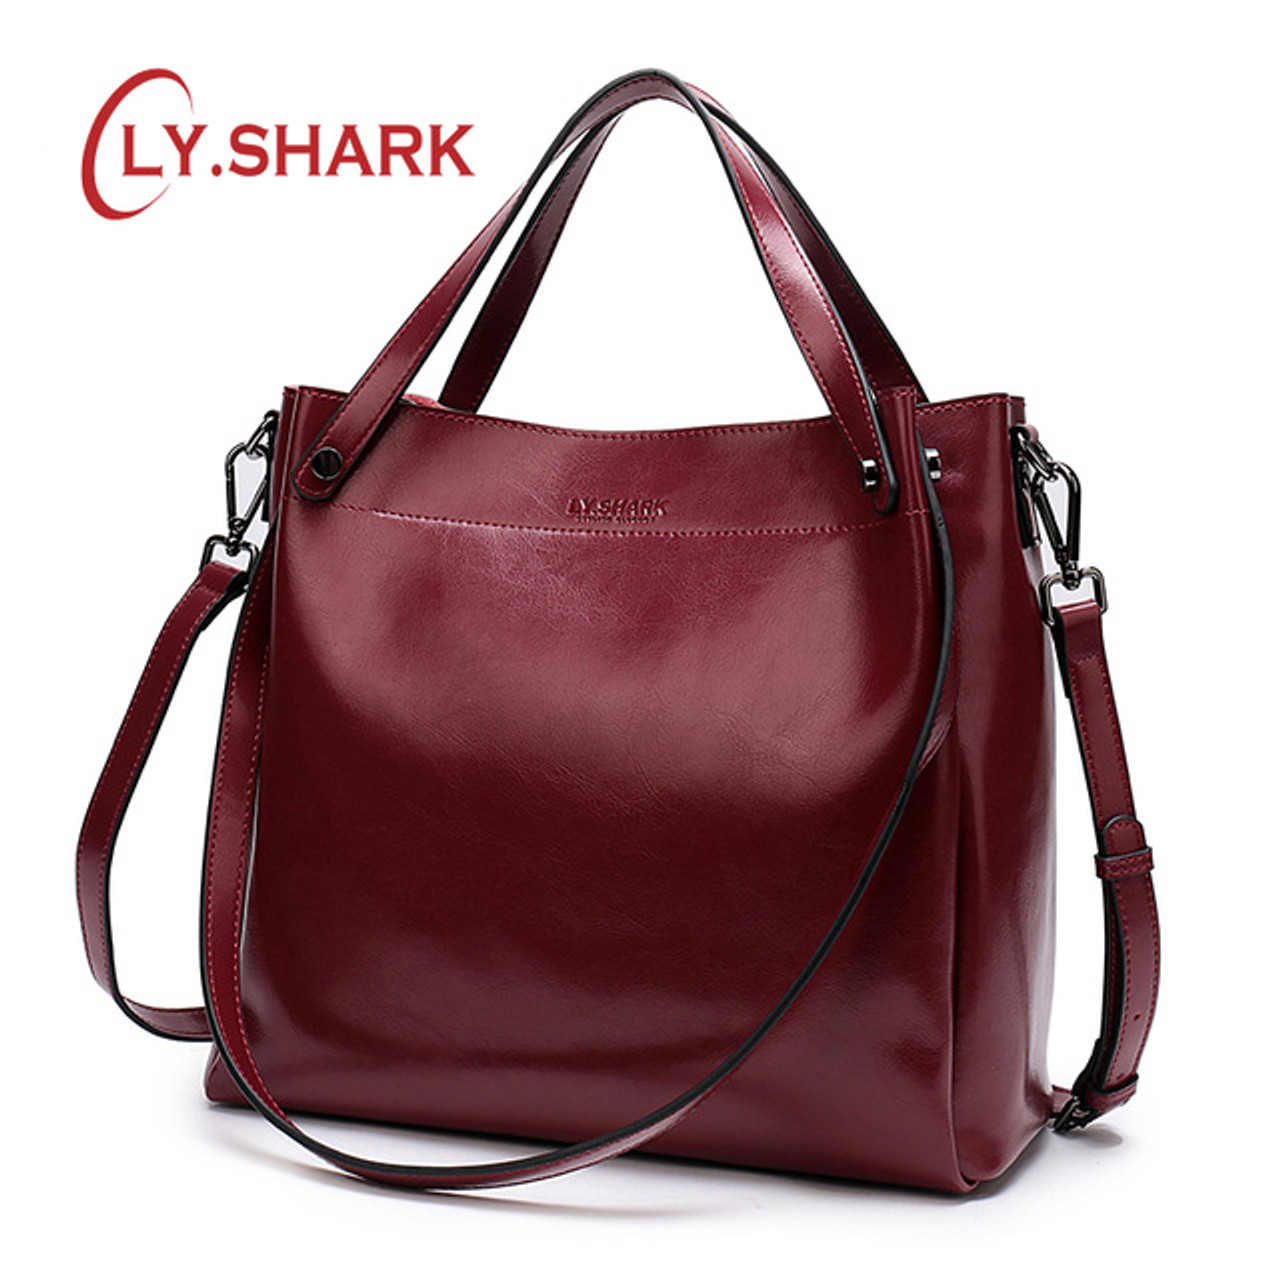 6a57c998b5 SHARK Female Bag Ladies Genuine Leather Bags For Women 2019 Crossbody  Messenger Bag Women ...